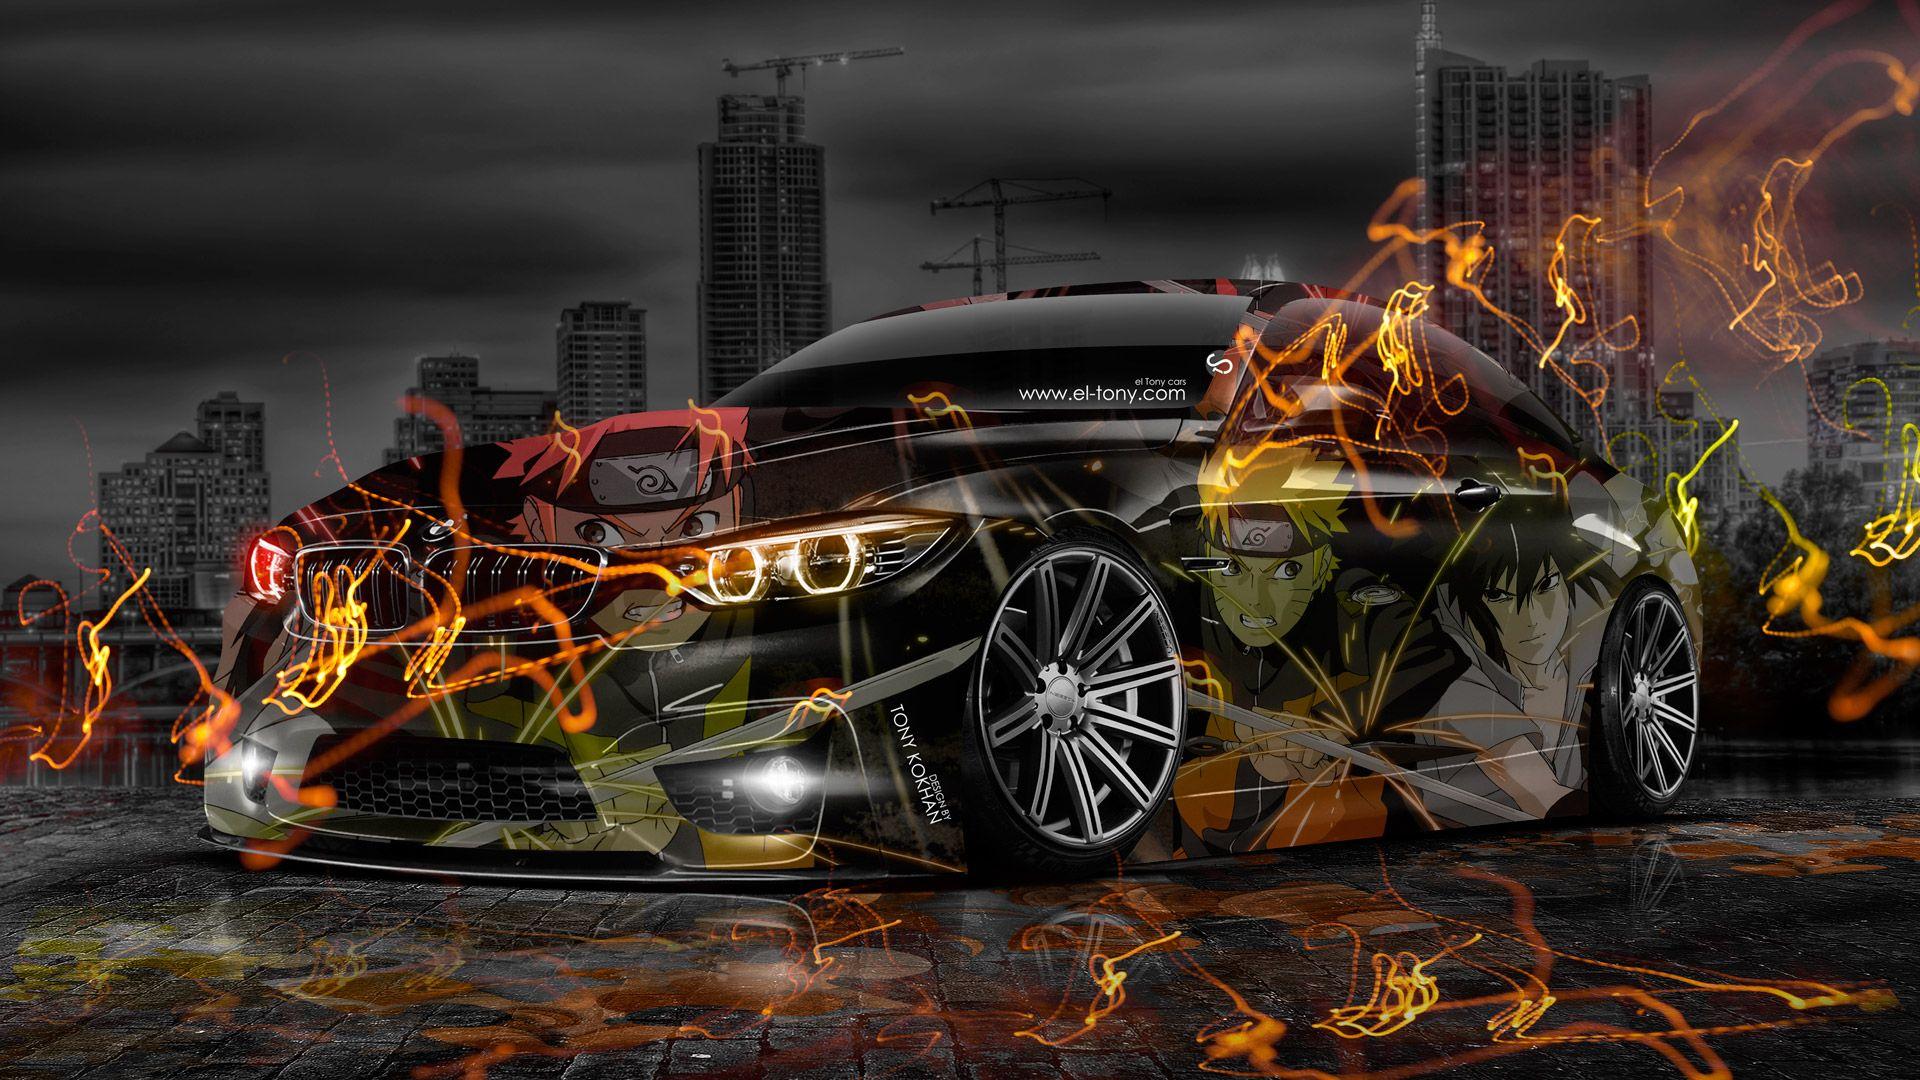 Merveilleux BMW M4 Anime Aerography Naruto City Car 2014